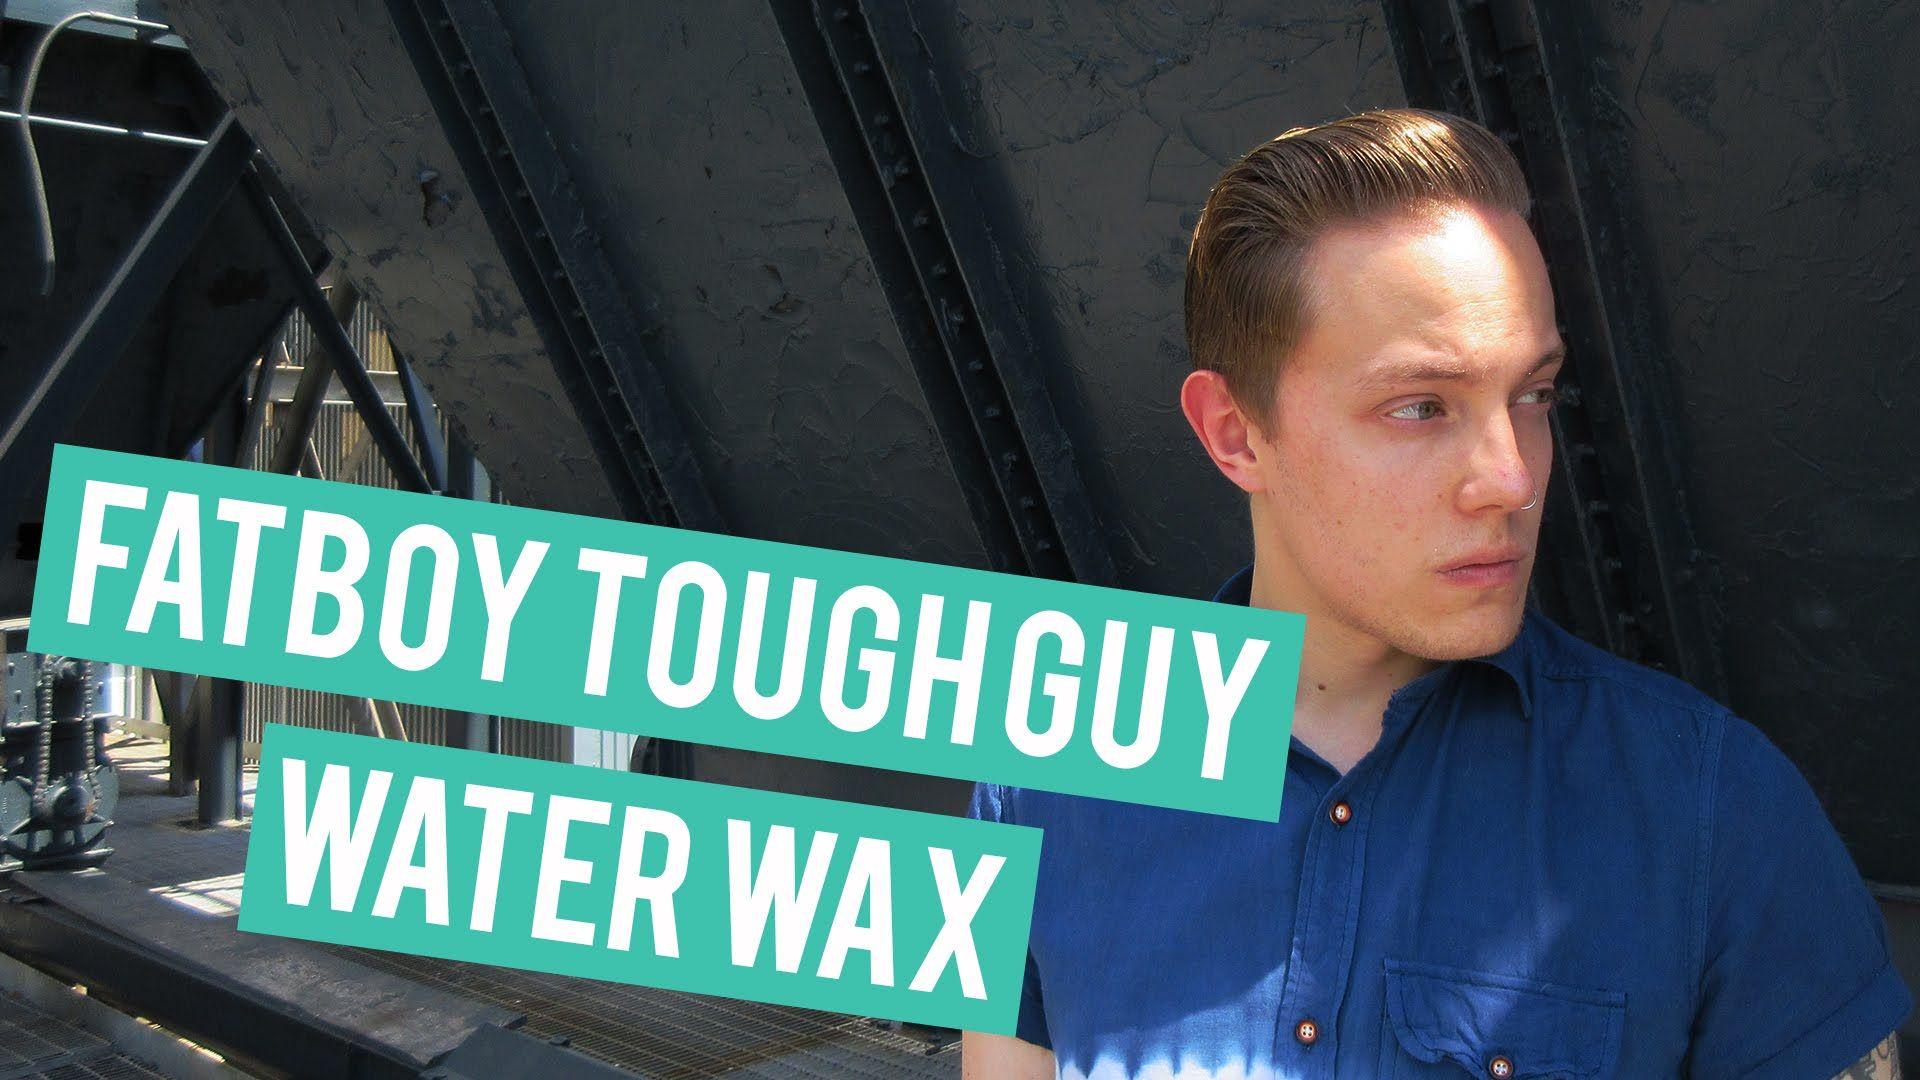 Menus hair product review fatboy tough guy water wax menus hair